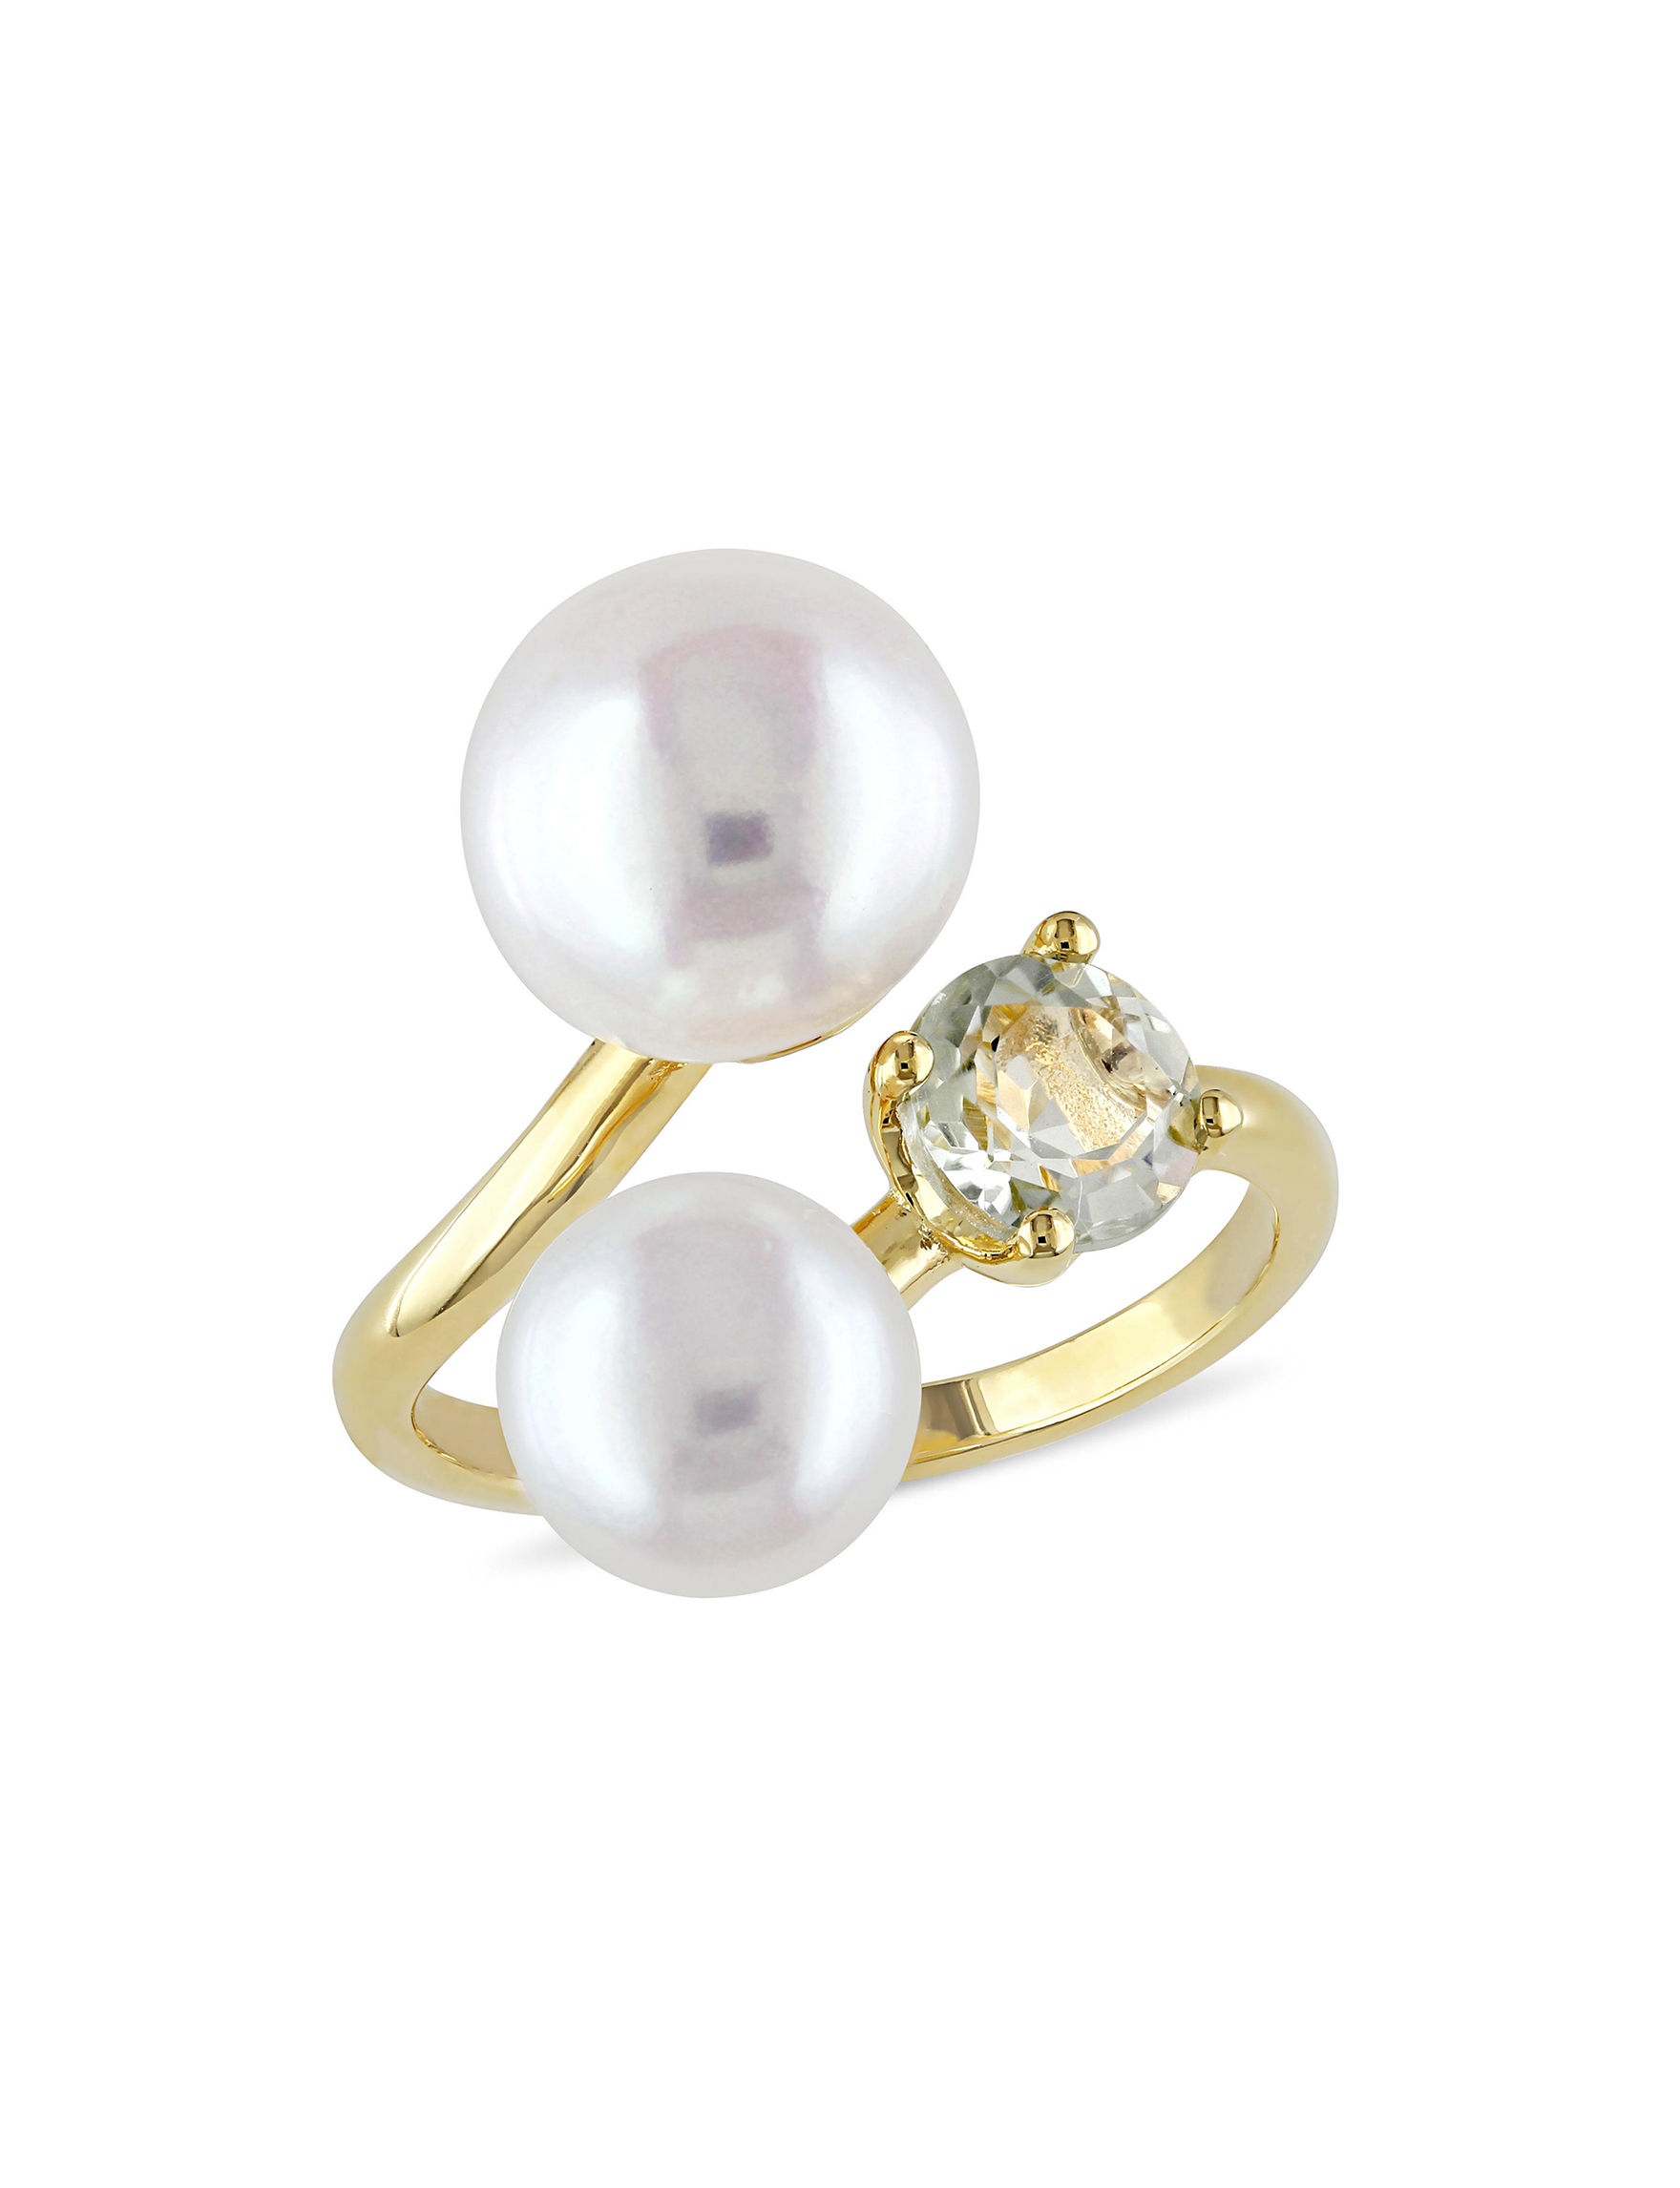 Michiko Gold Rings Fine Jewelry